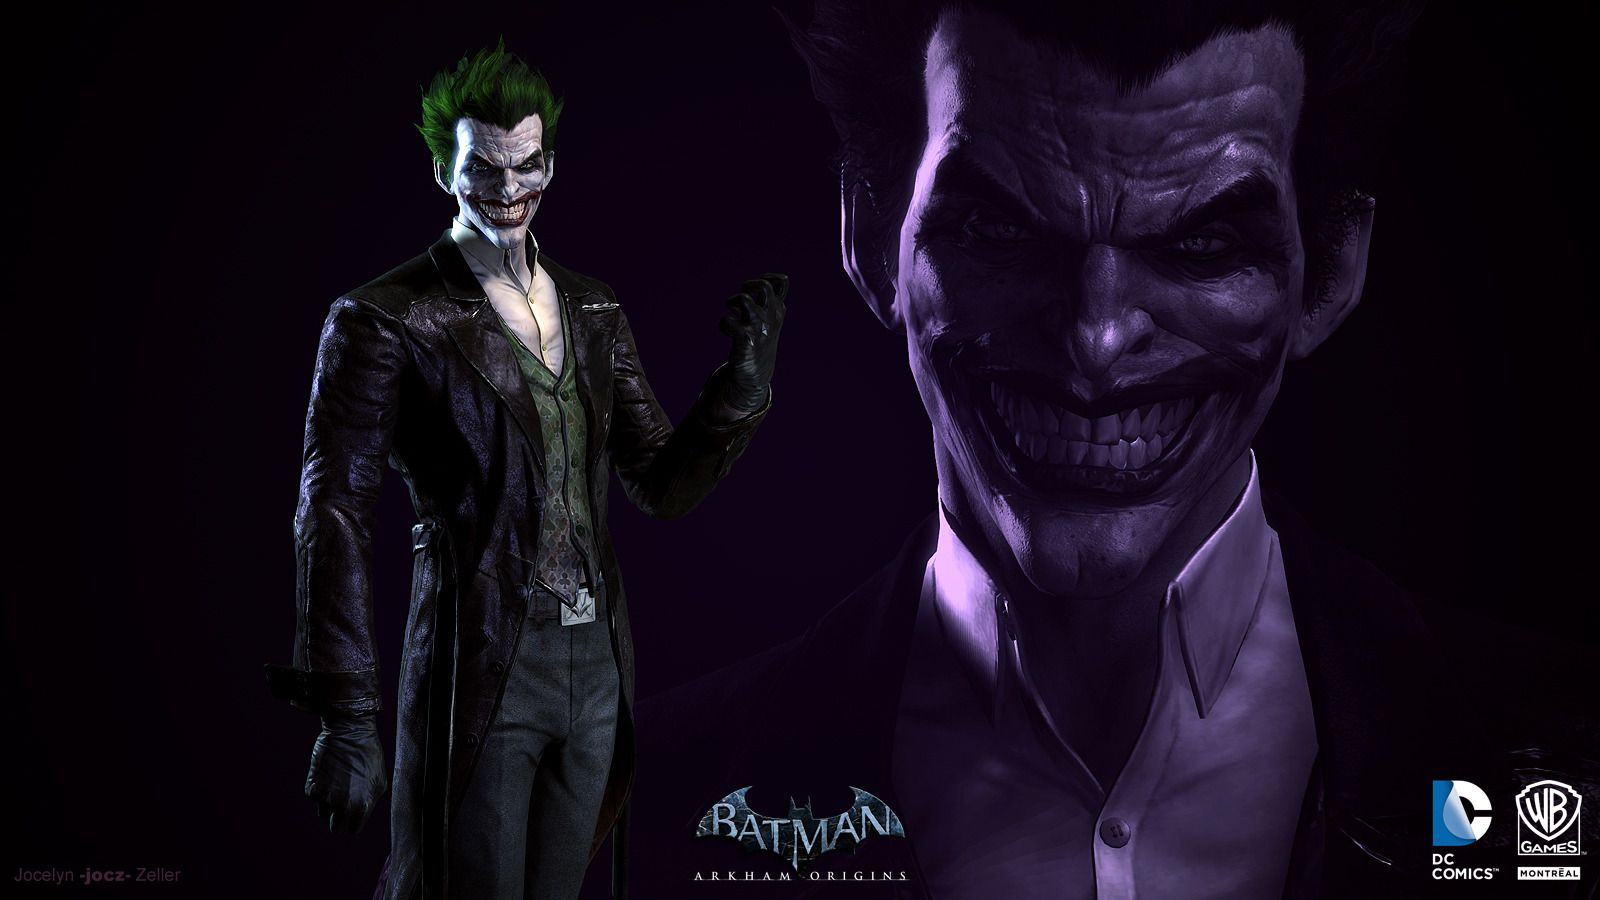 joker arkham origins g pinterest batman joker arkham origins voltagebd Images